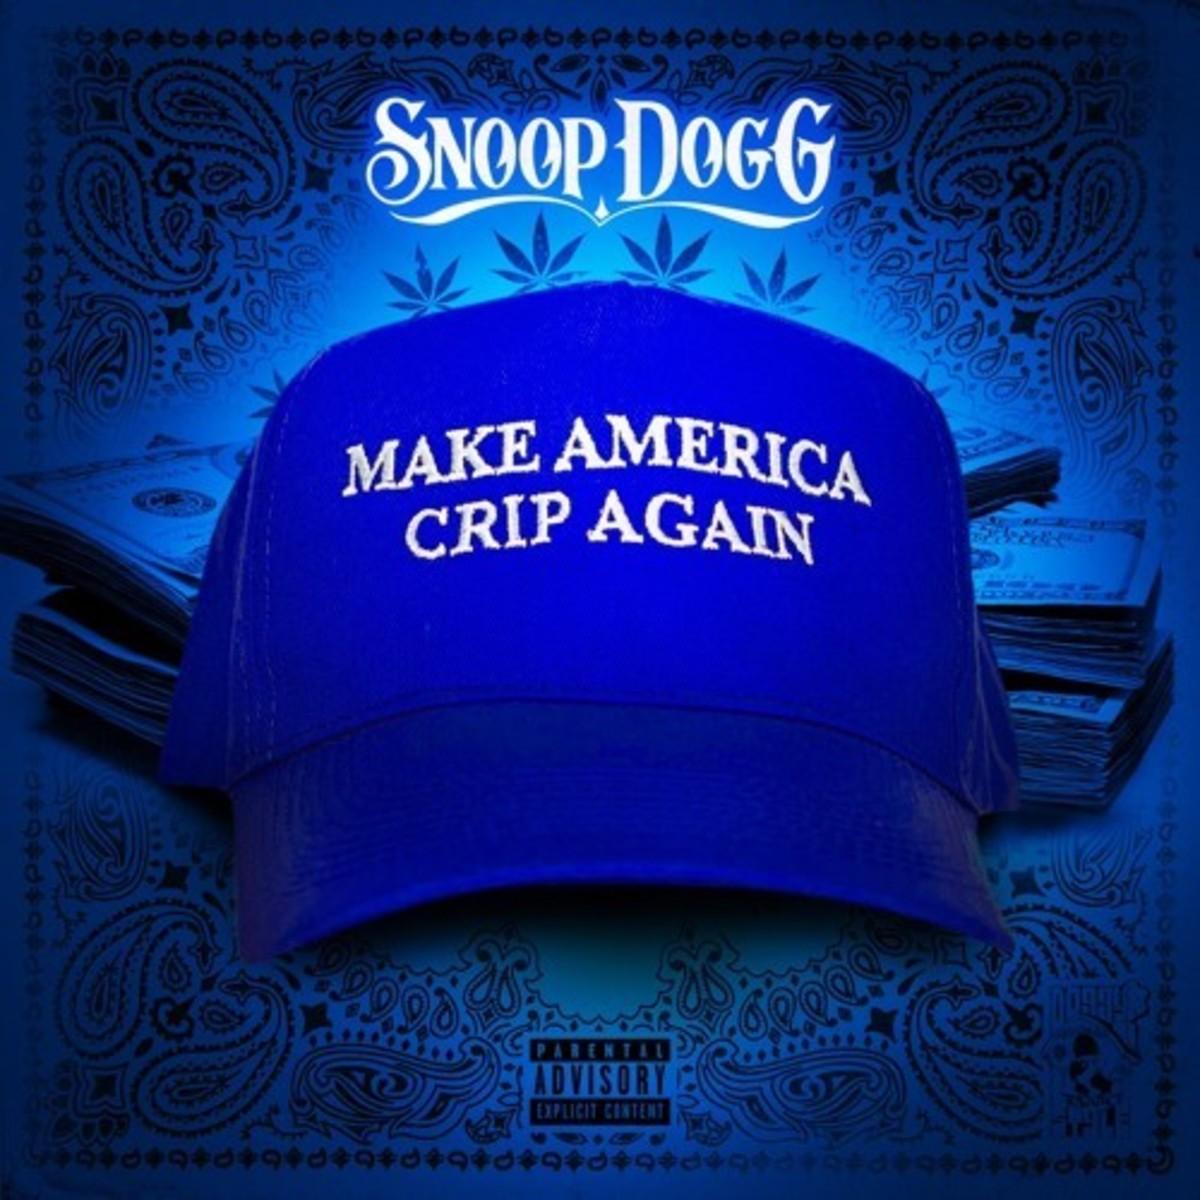 snoop-dogg-make-america-crip-again.jpg